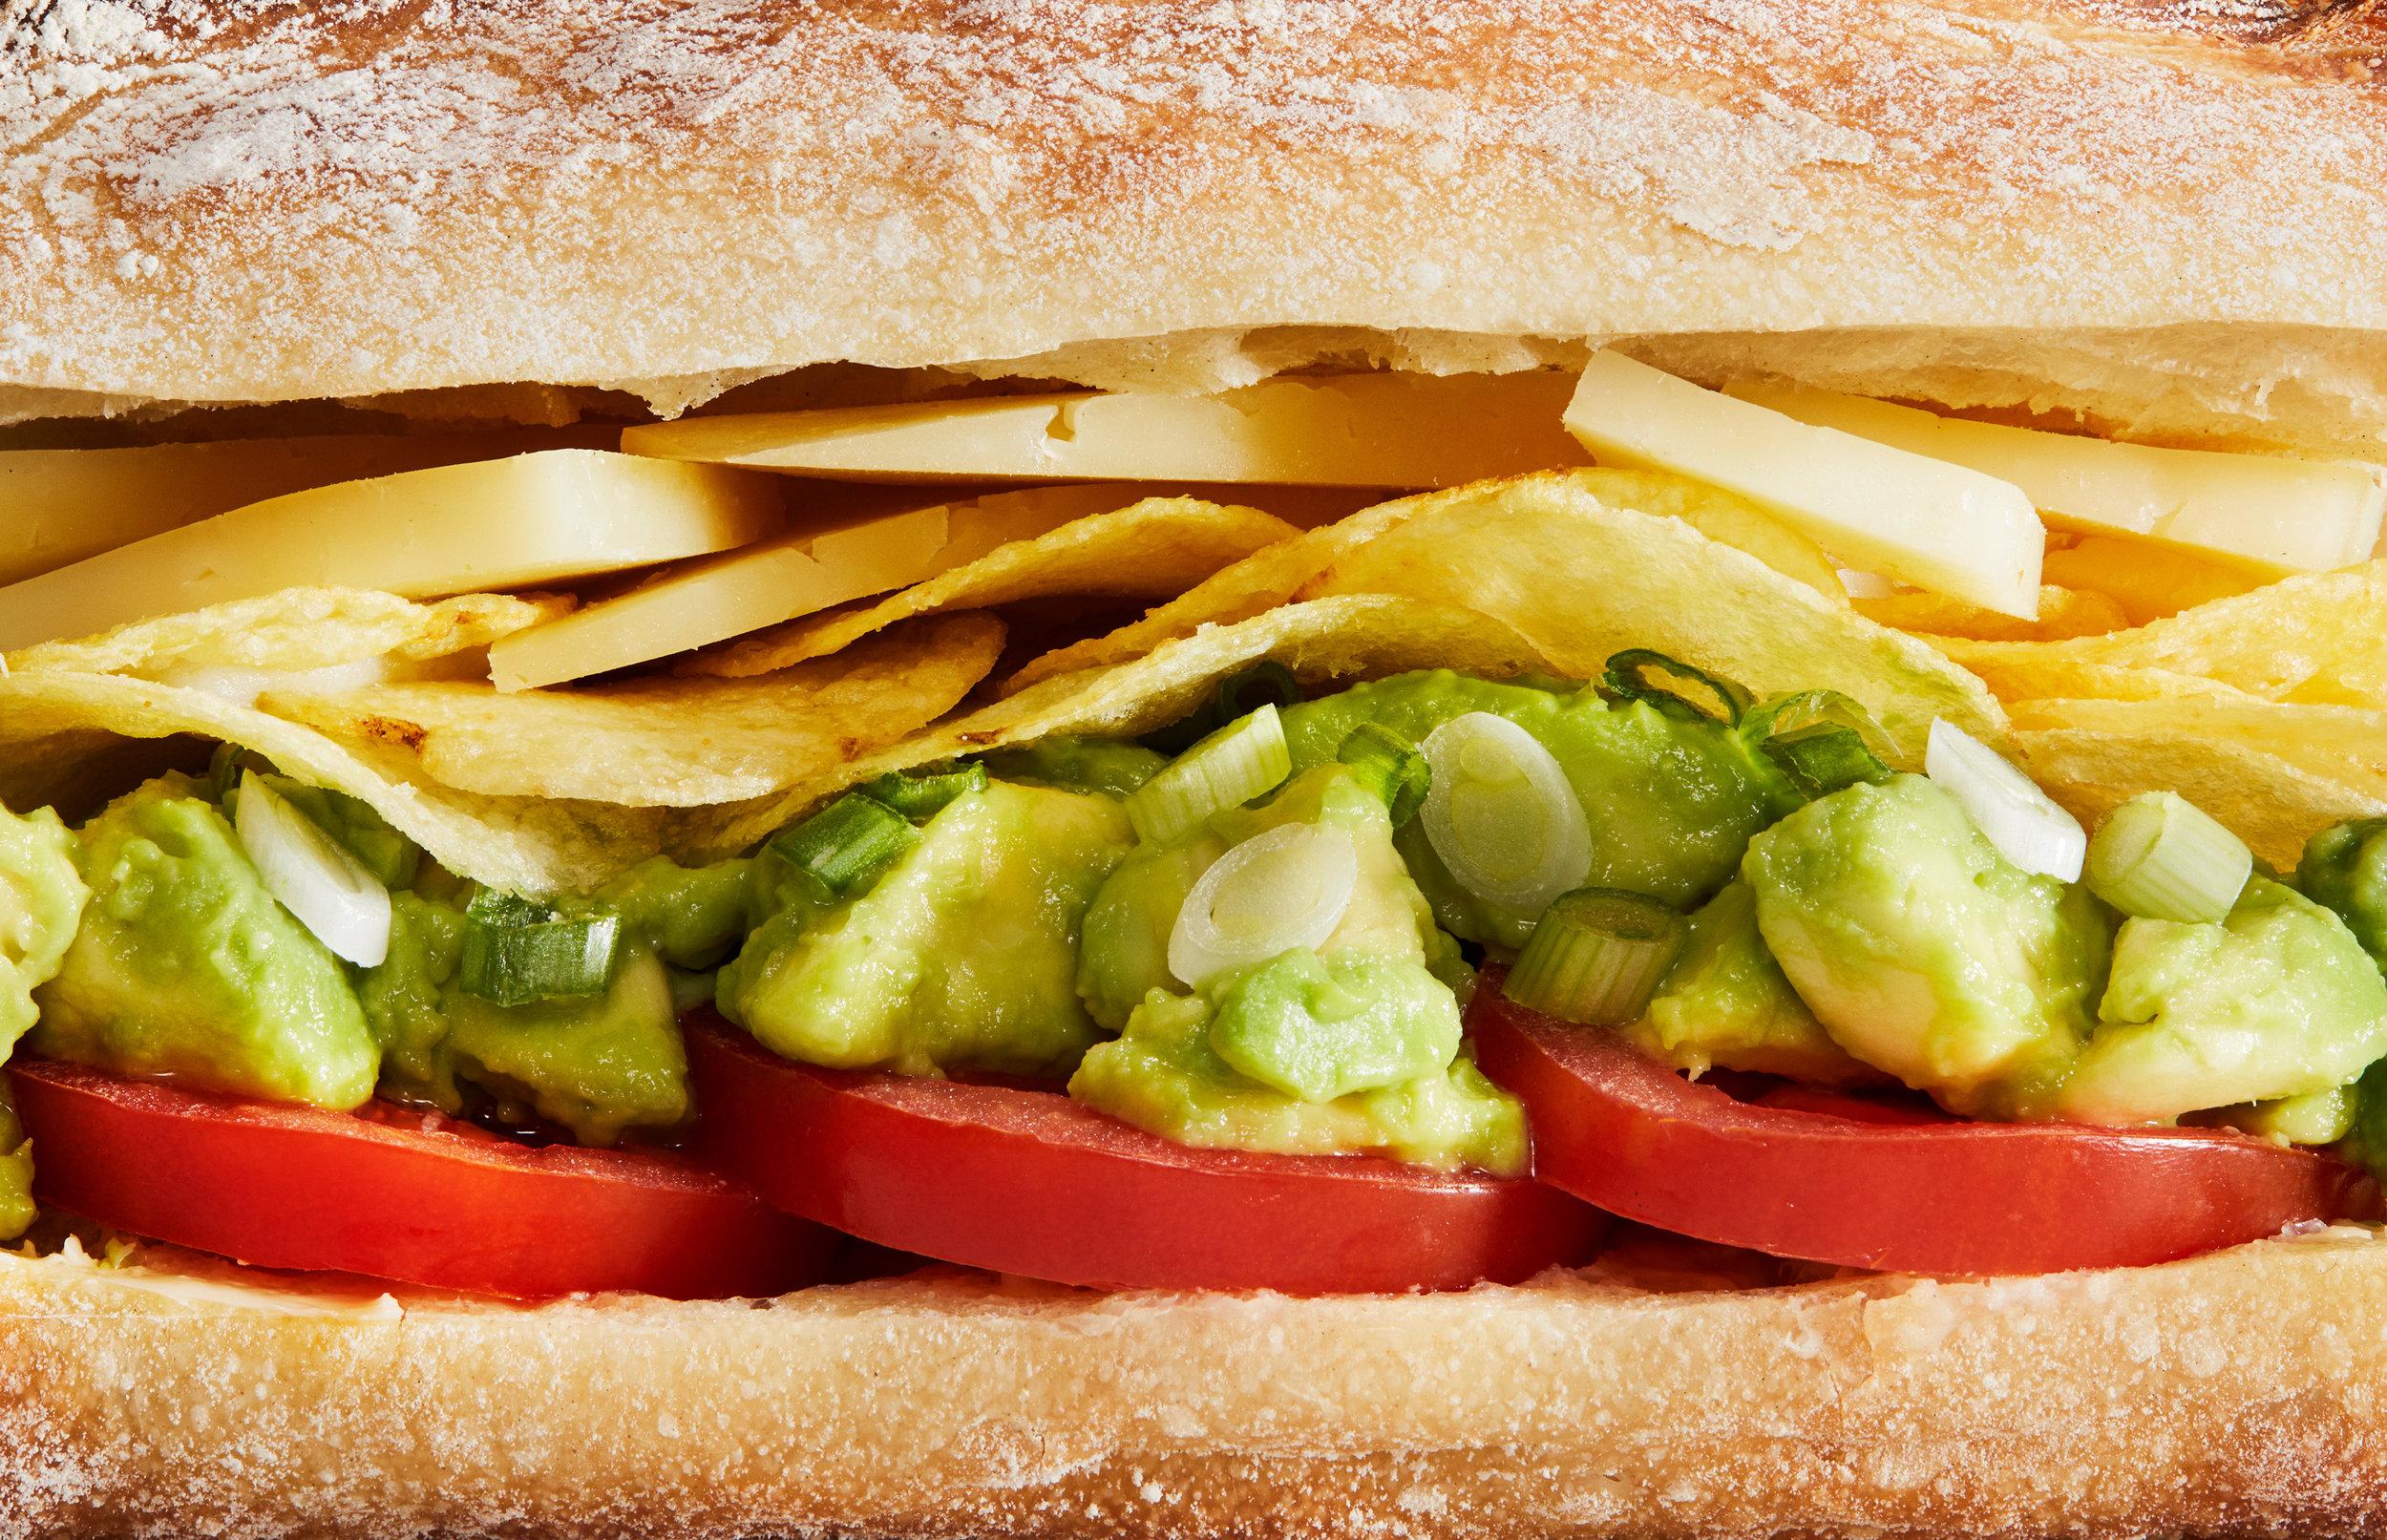 20161205+Sandwich+1-6451.jpg